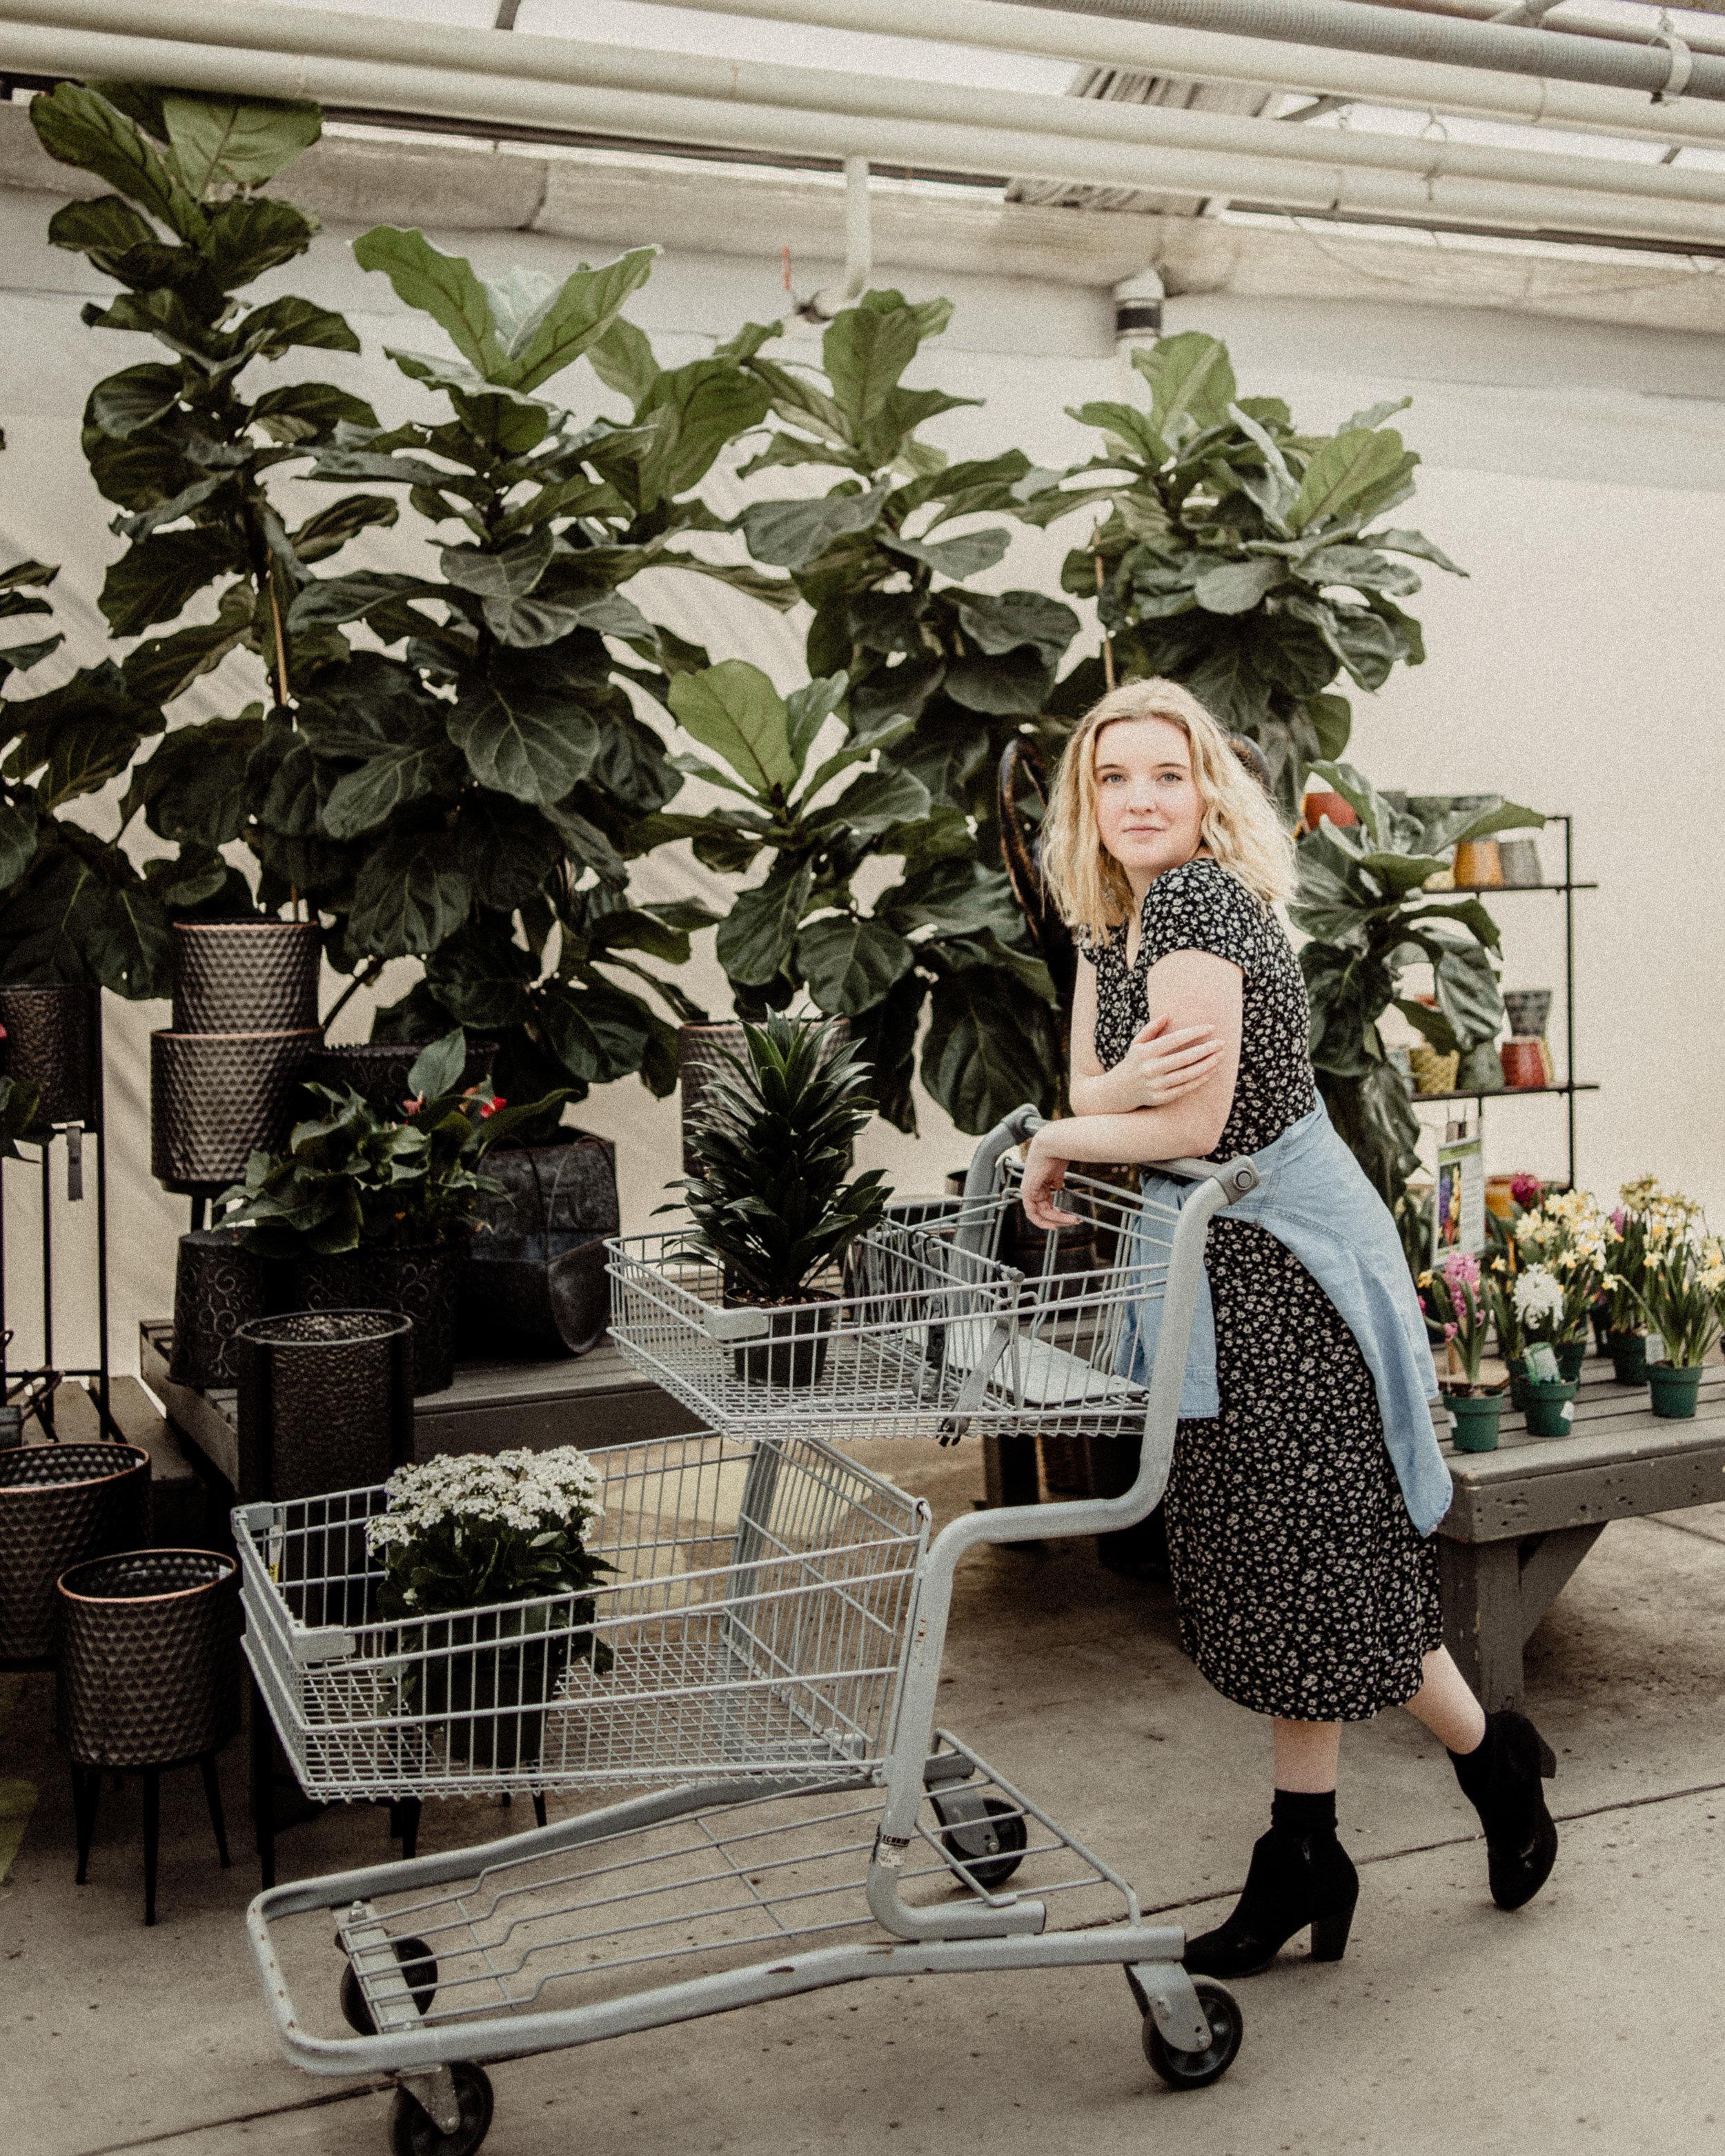 Nicole Mullaly-20180225-15-13-30.JPG